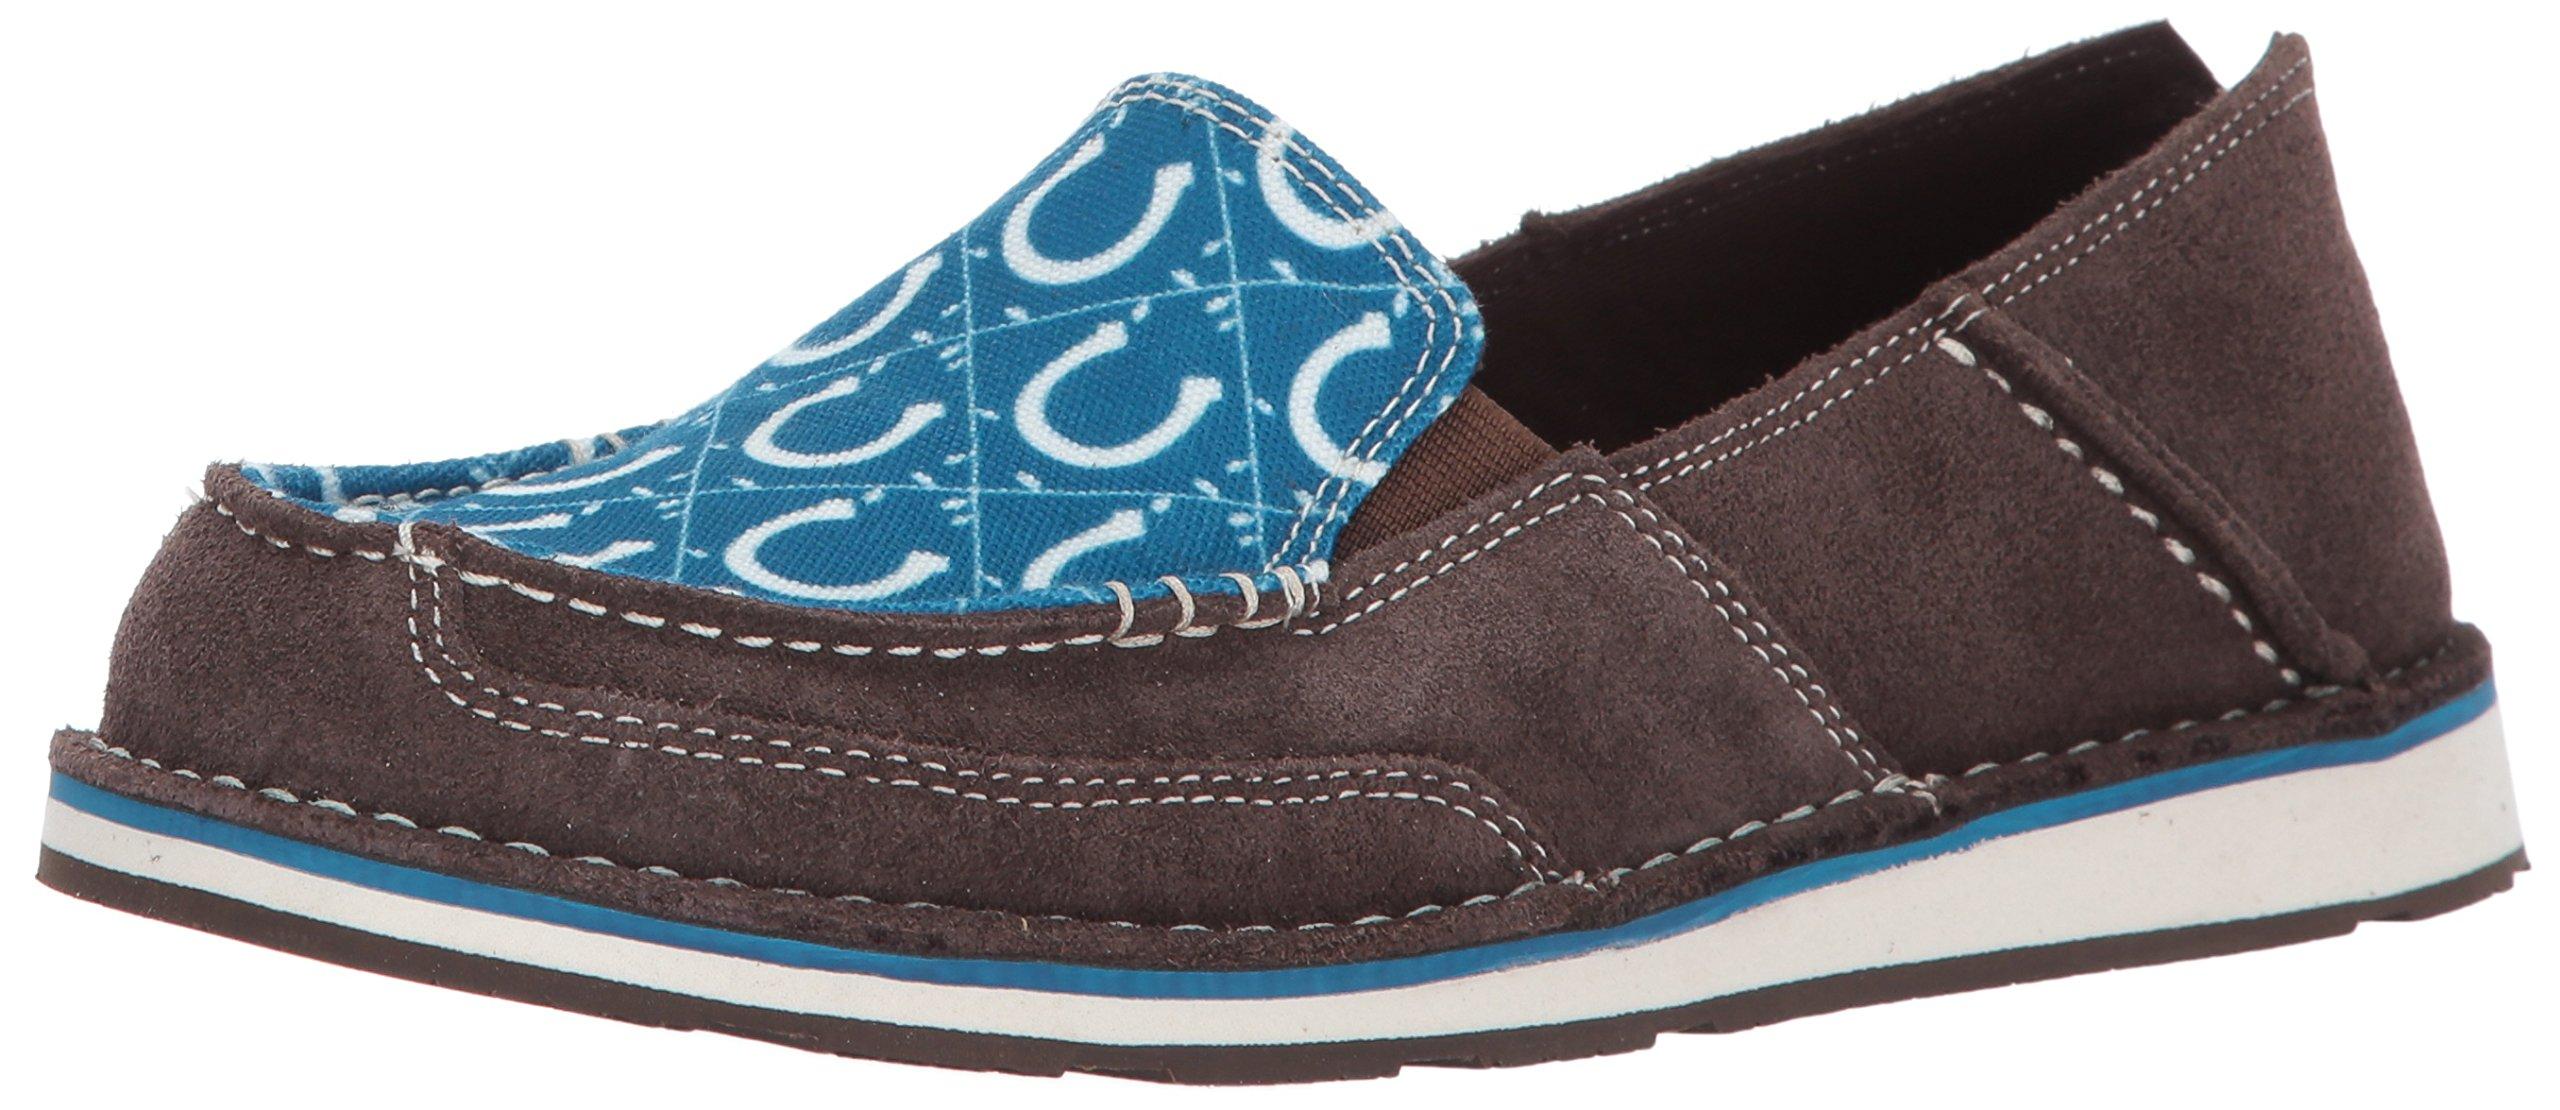 Ariat Women's English Cruiser Work Boot, Chocolate/Seaport Shoes, 10 B US